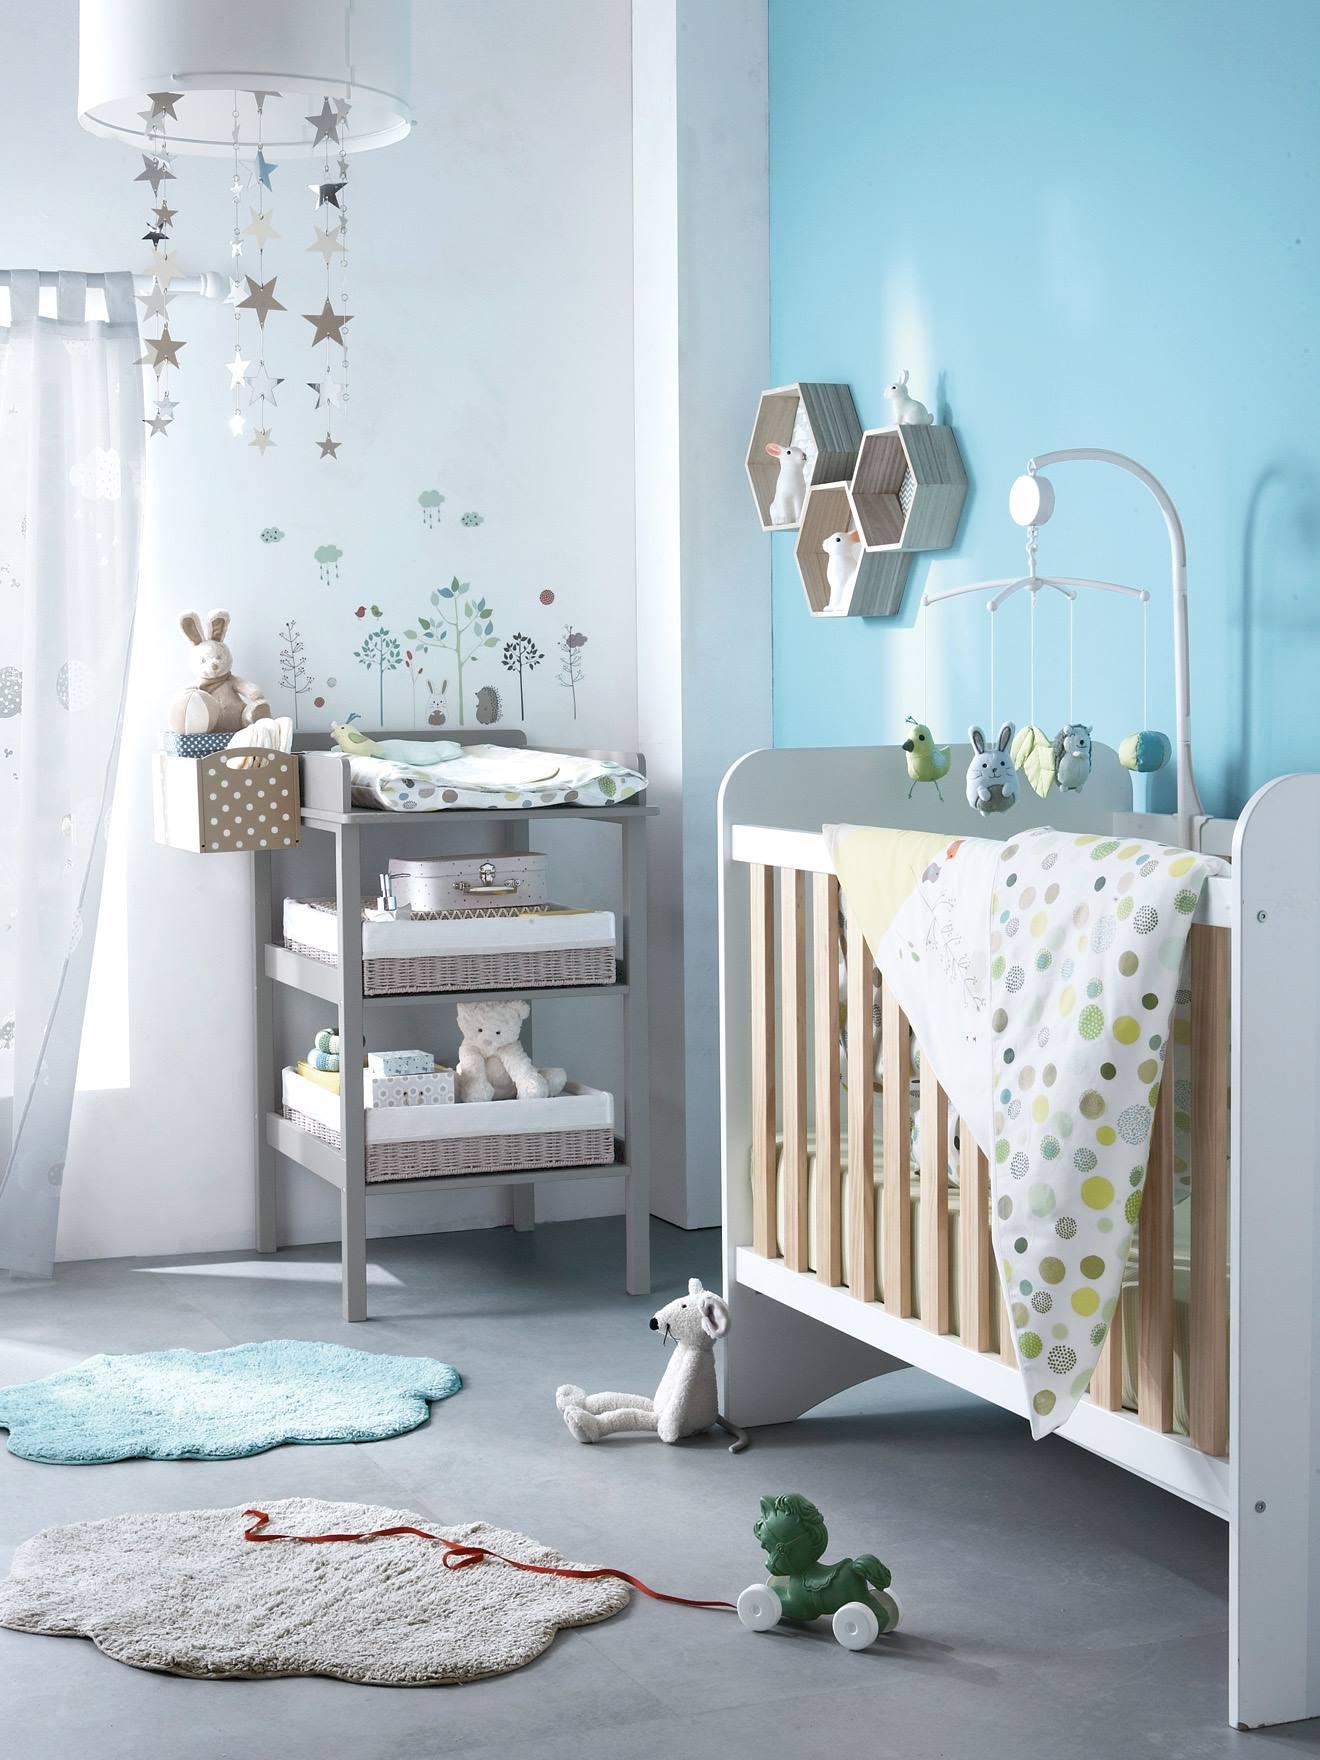 tapis nuage bebe fabulous coussin nuage dormeur dco. Black Bedroom Furniture Sets. Home Design Ideas